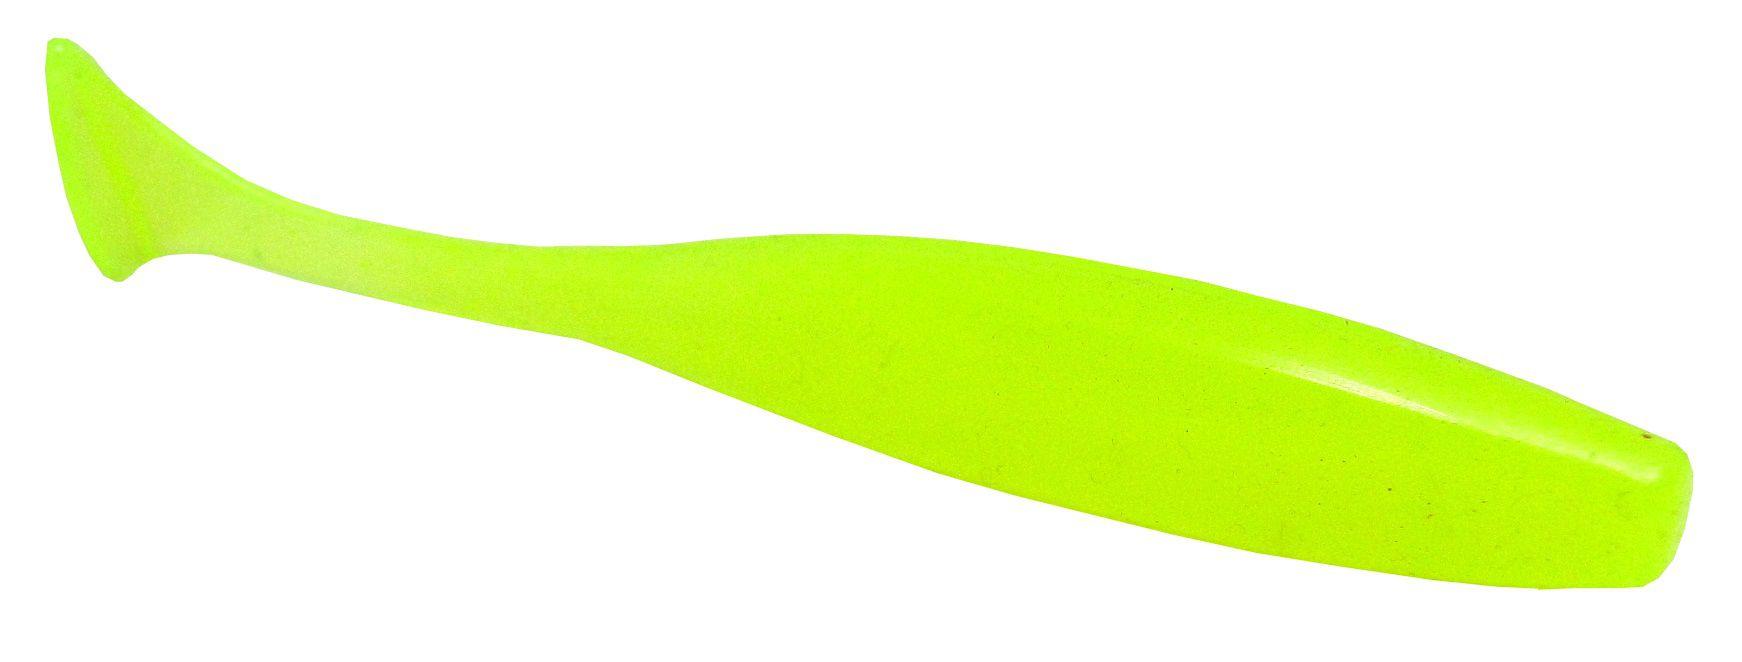 Paddle Shad (Isca Soft) 10cm